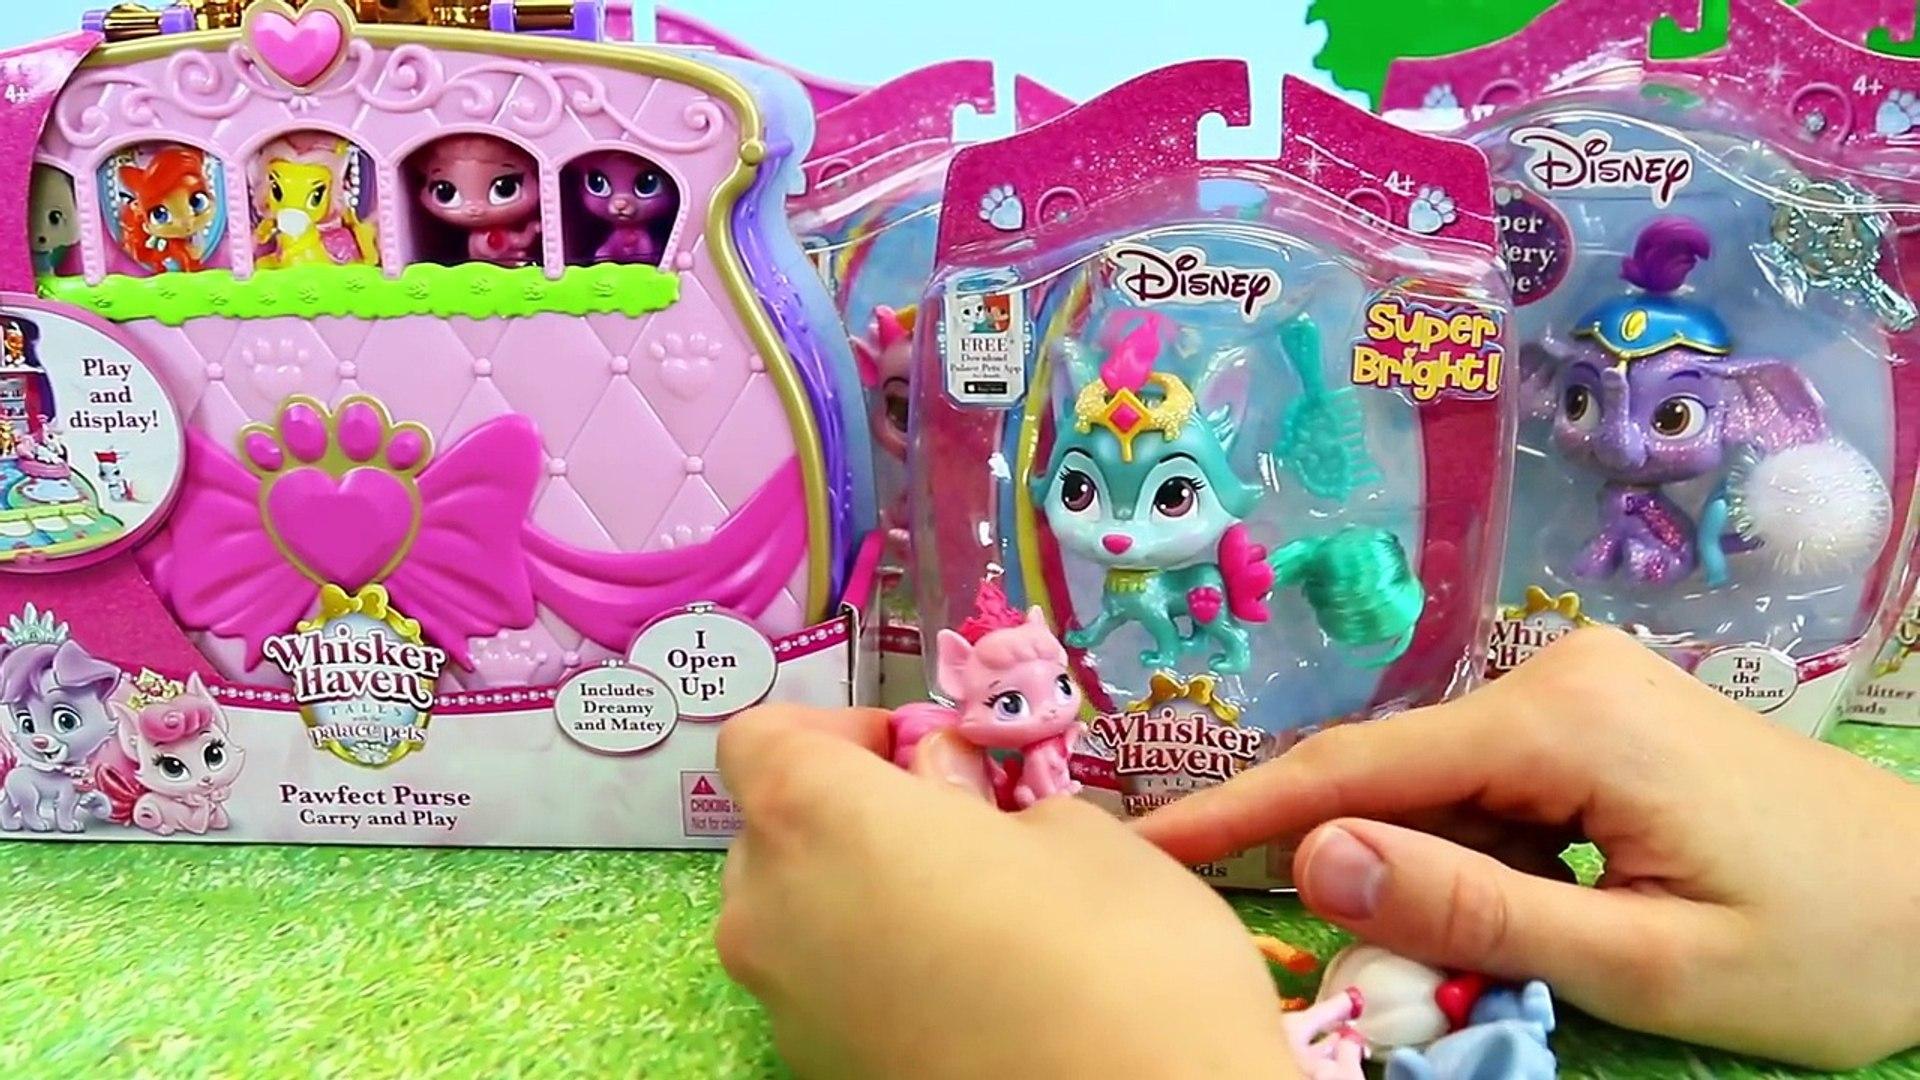 Toy Hospital PALACE PETS Sick Visit Pet Vet Doctor Barbie & New Home Disney Princess Pet C